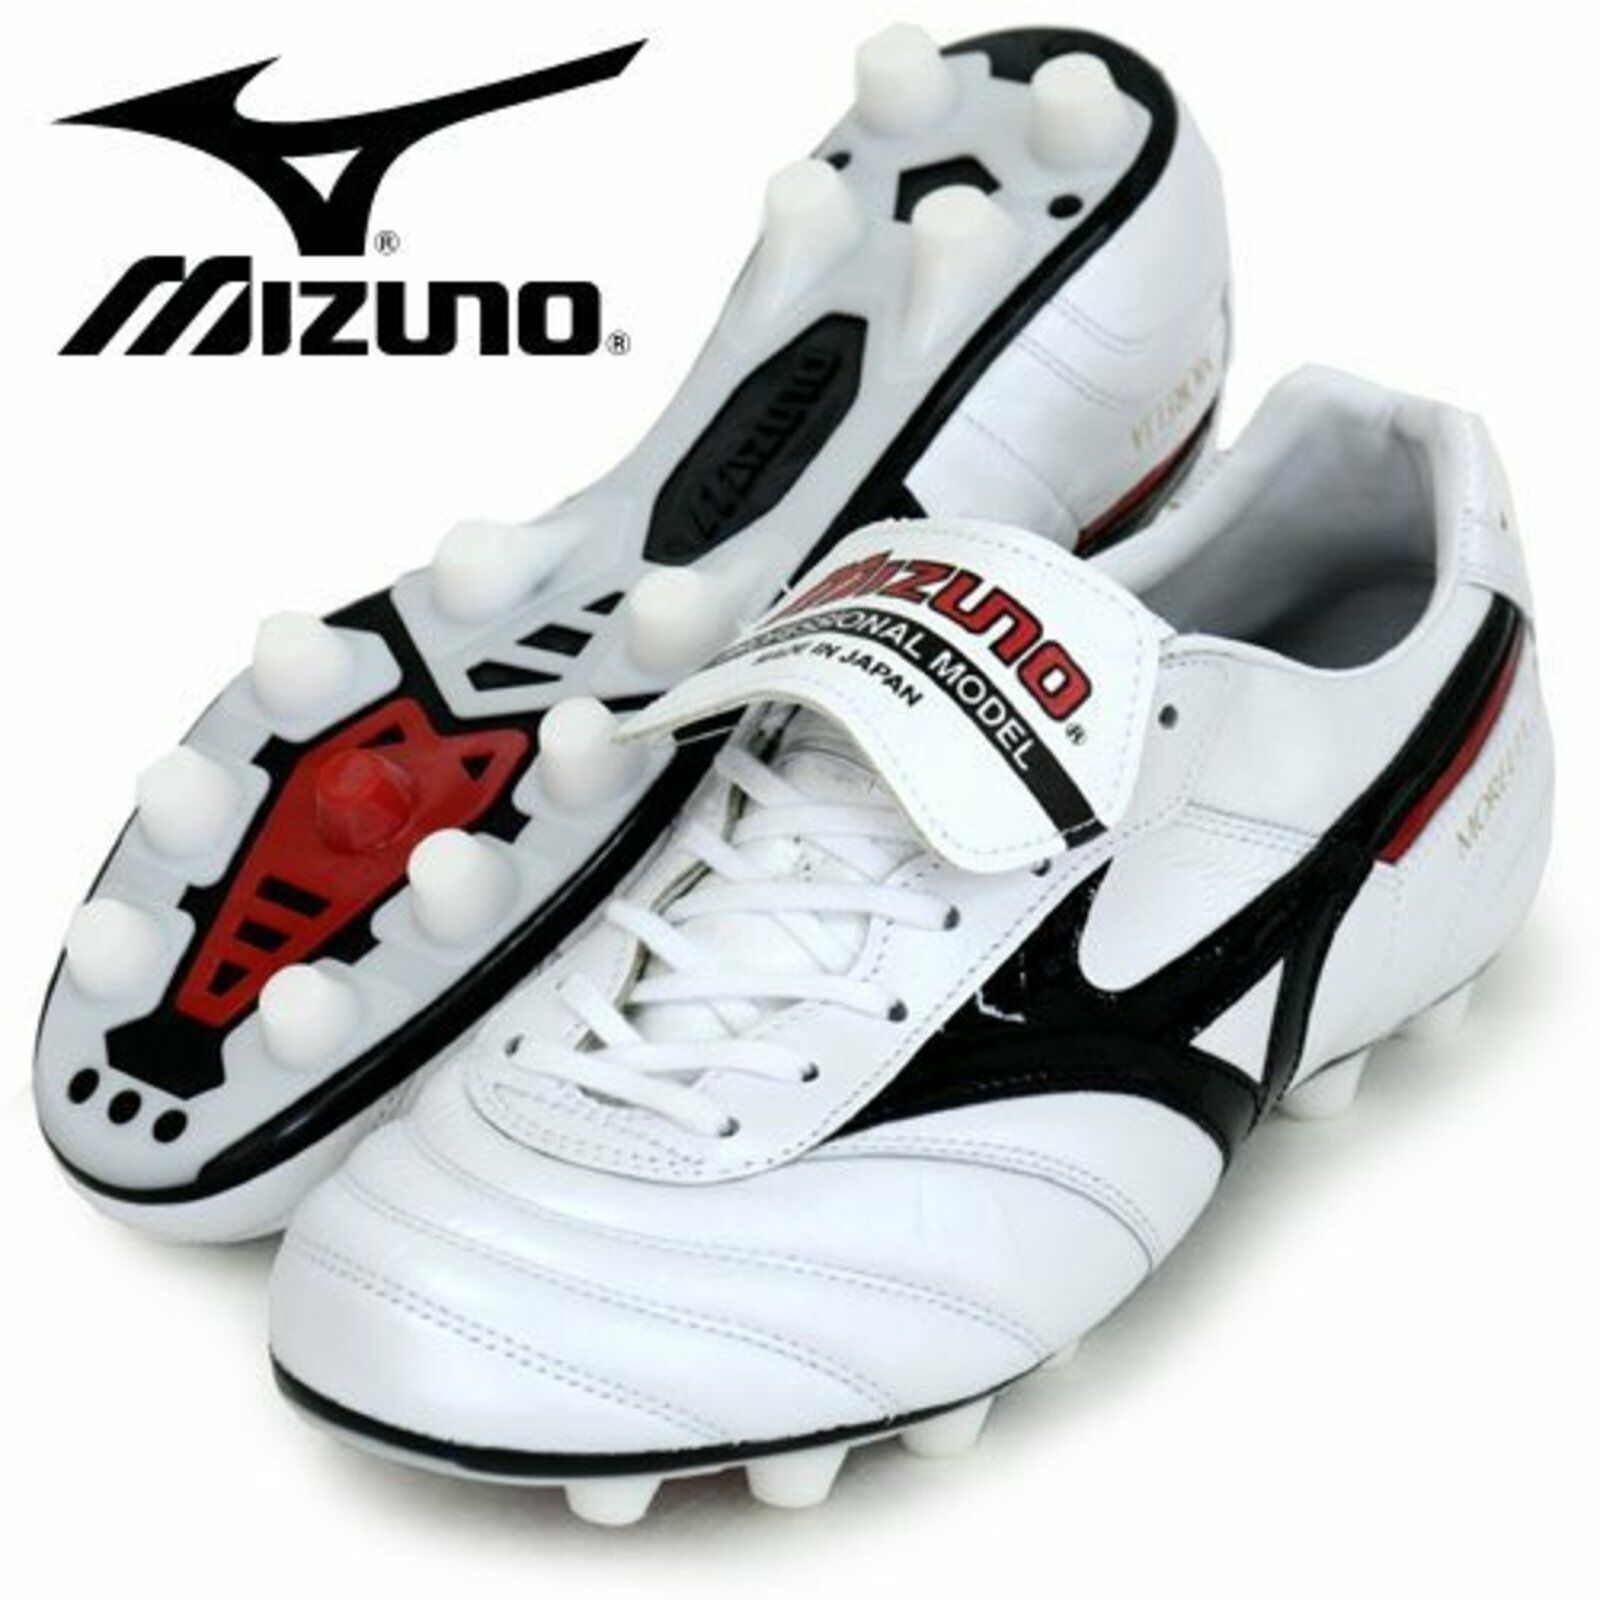 MIZUNO Soccer Football Spike chaussures MORELIA 2 P1GA1501 09 blanc US9(27cm) F S nouveau